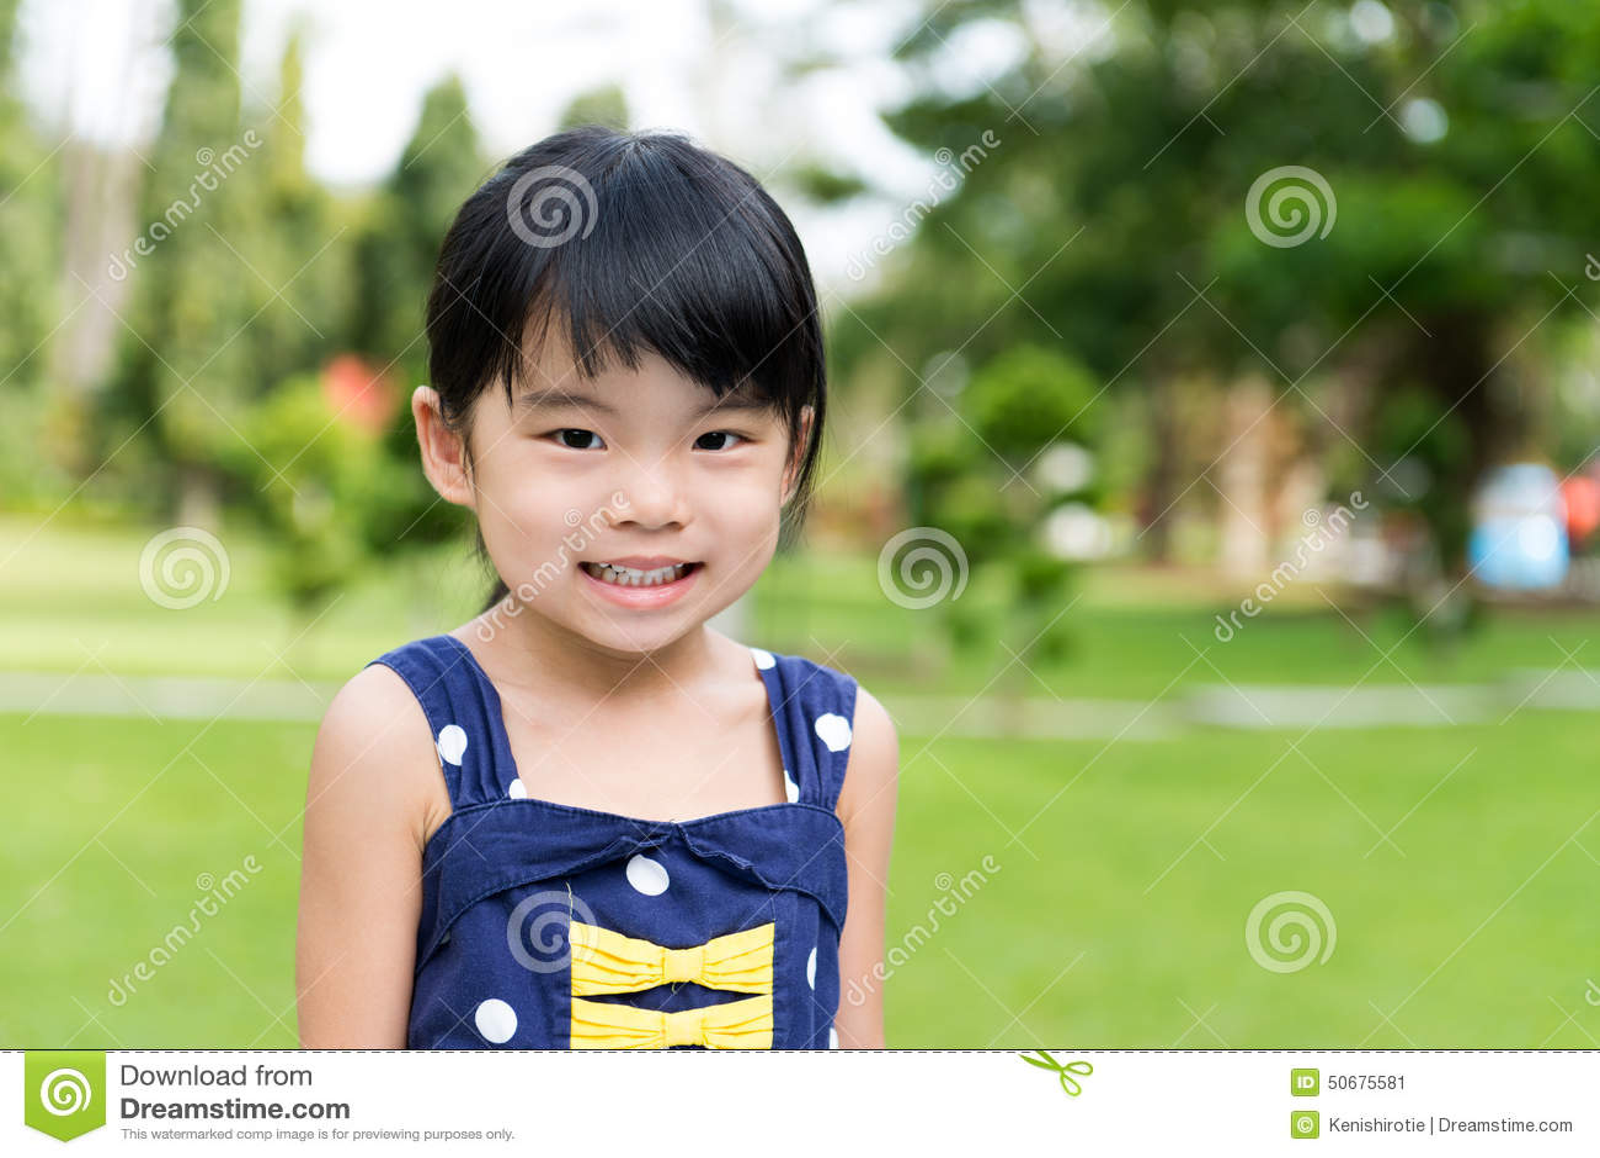 Download 小亚裔女孩在公园 库存图片. 图片 包括有 聚会所, 庭院, 春天, 孩子, 幸福, 放松, 敬慕, 微笑 - 50675581